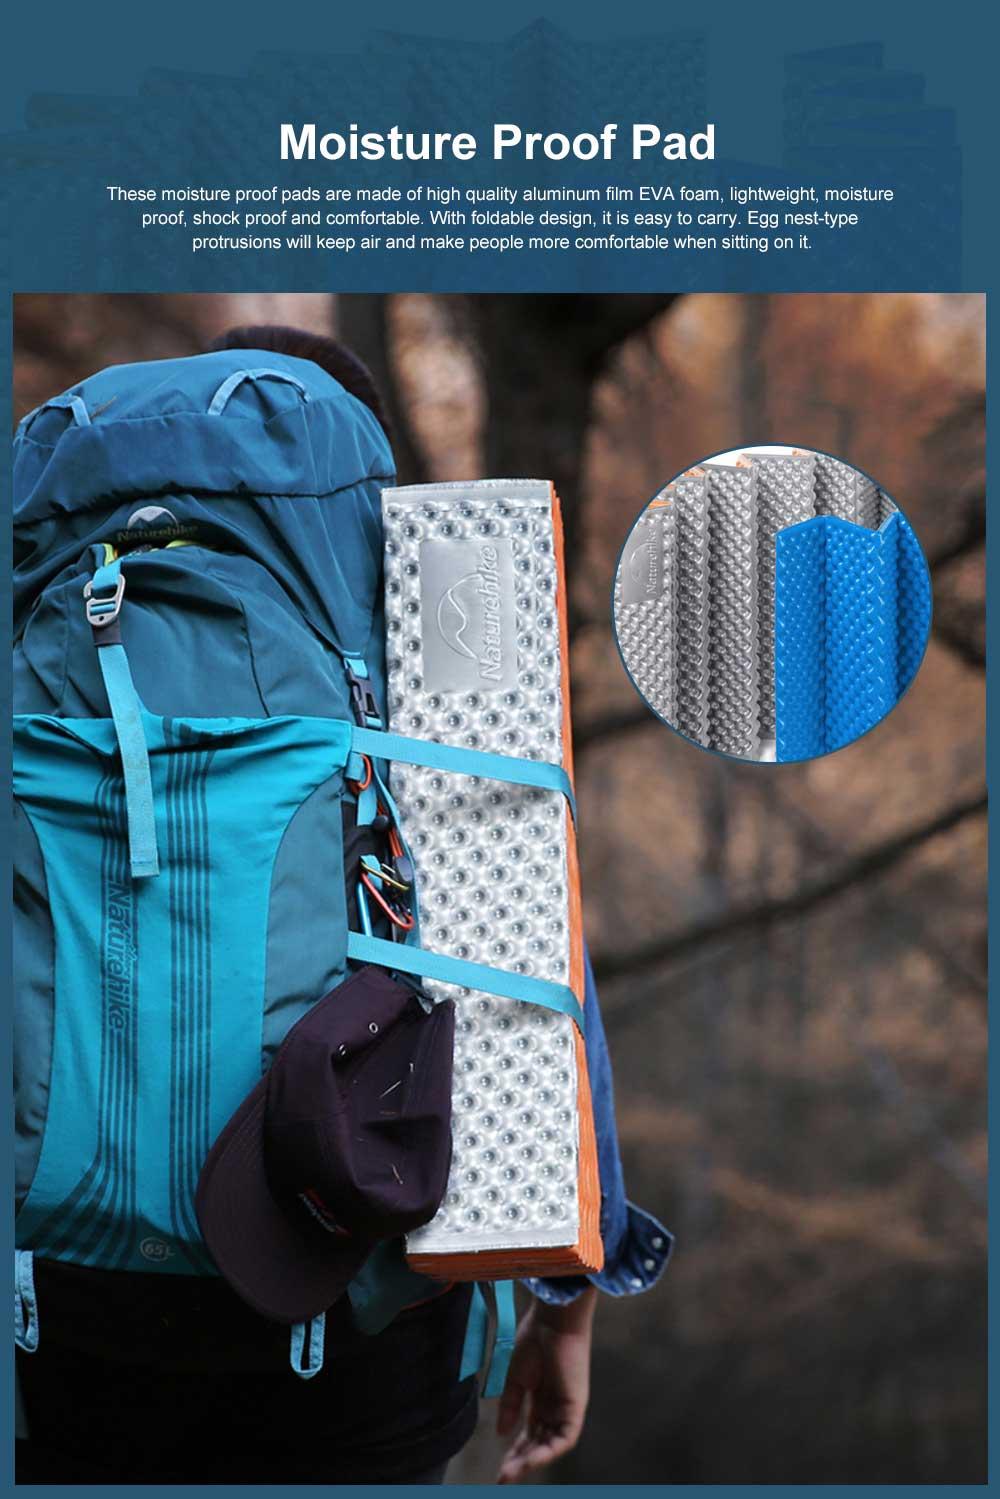 Moisture Proof Sleeping Pad, Portable Eva Aluminum Film Floor Mat, Seat Cushion Pad for Outdoor Camping Picnic 0